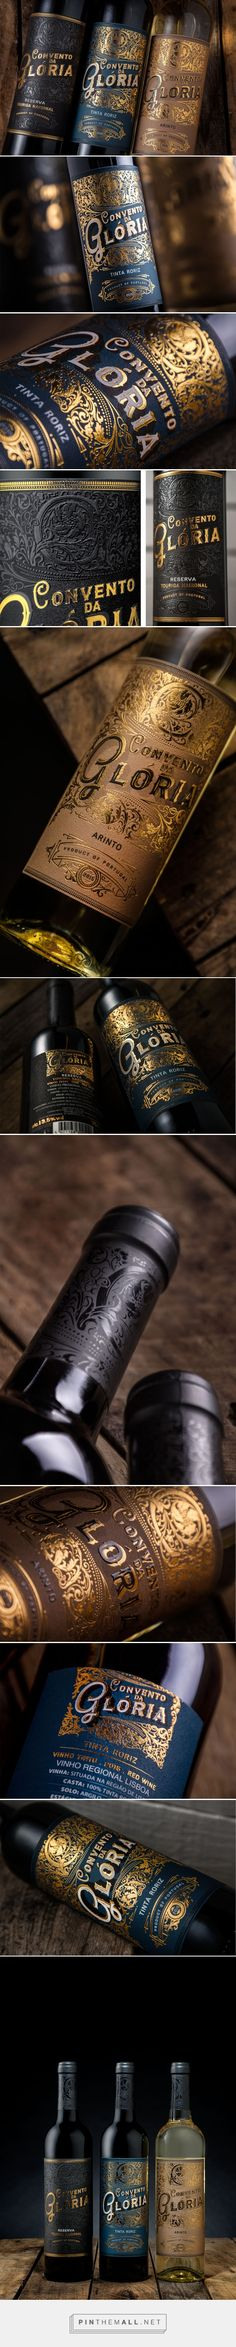 Convento da Glória wine label design by M&A Creative Agency (Portugal) #wine #packaging